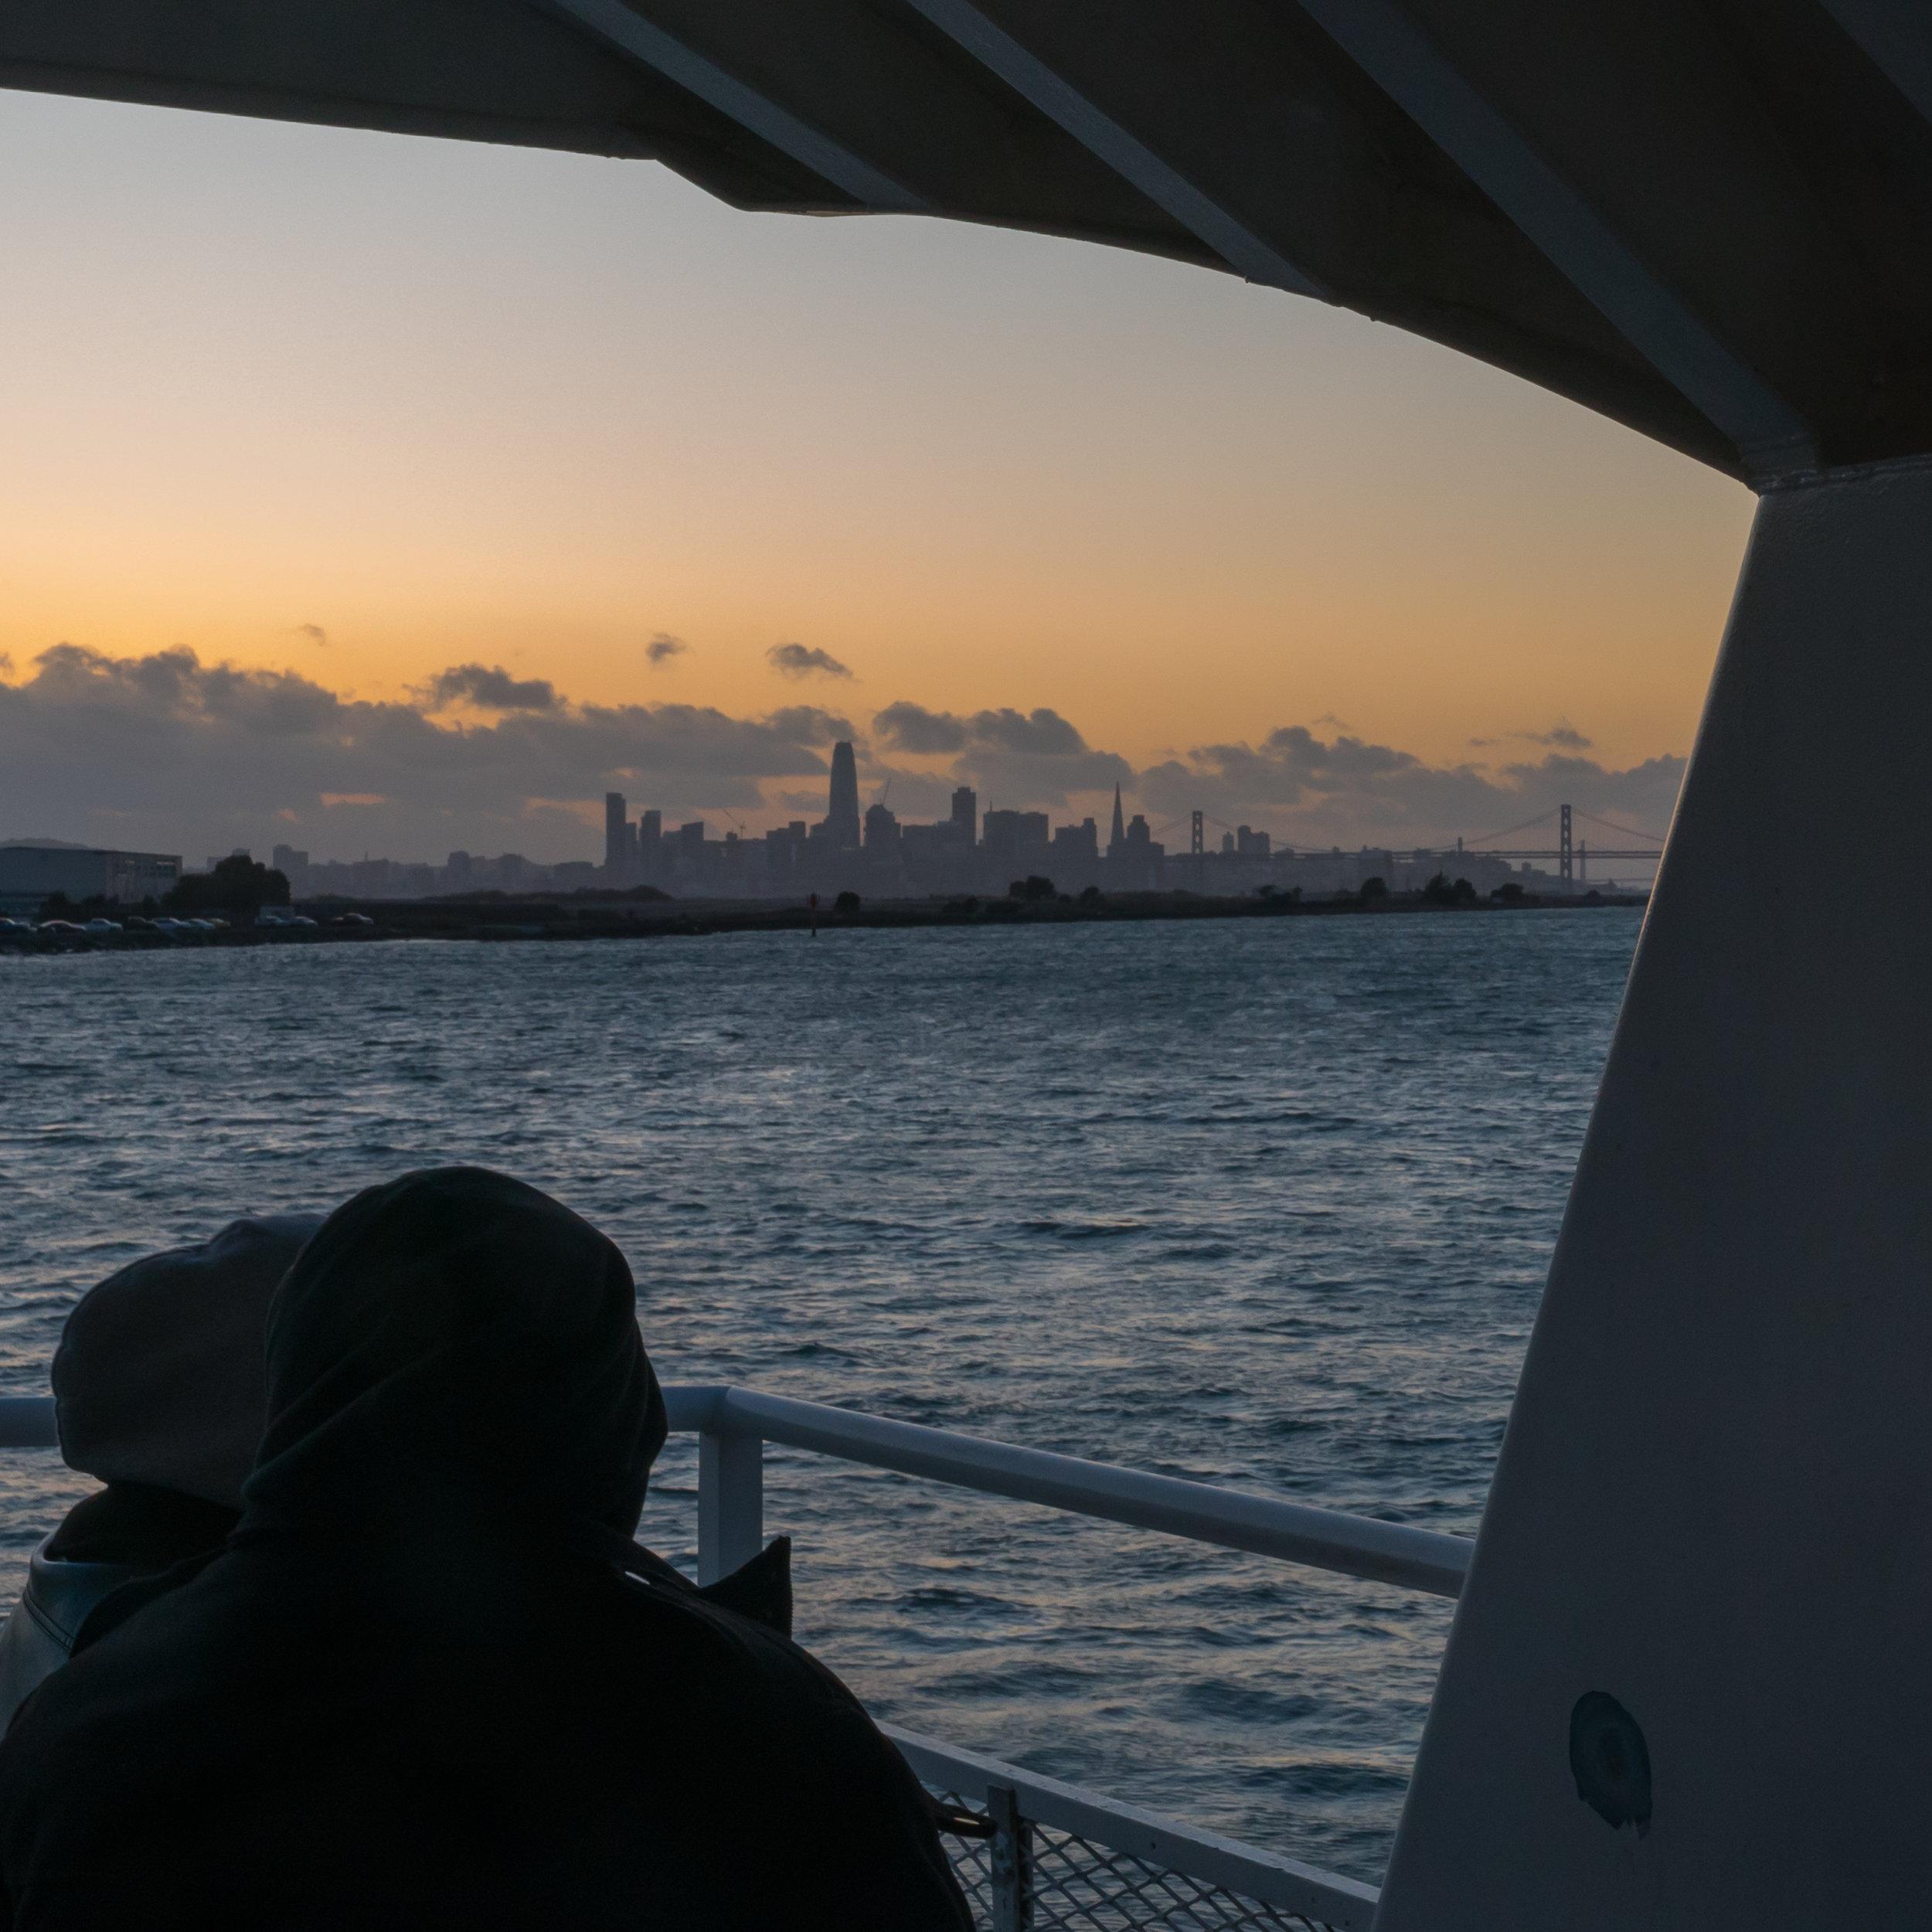 20180222-ferry-004.jpg